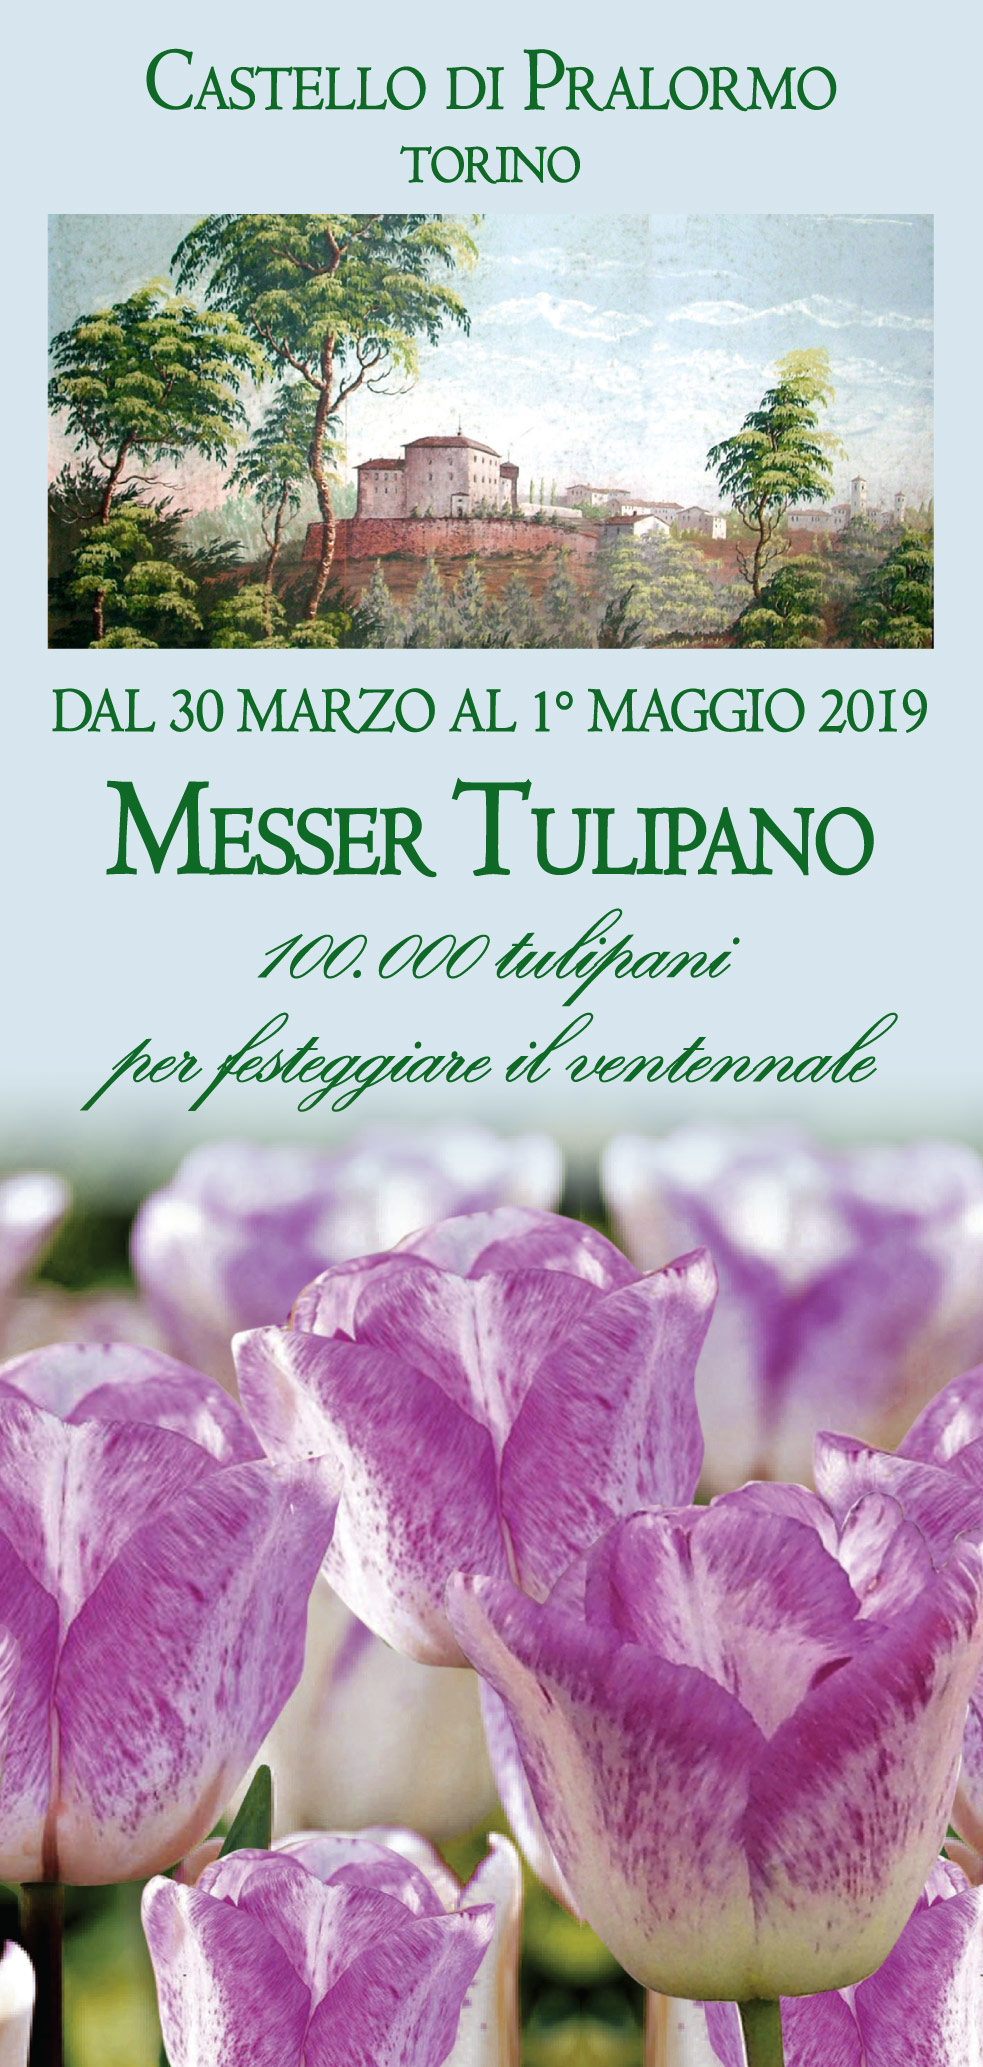 Messer Tulipano 2019